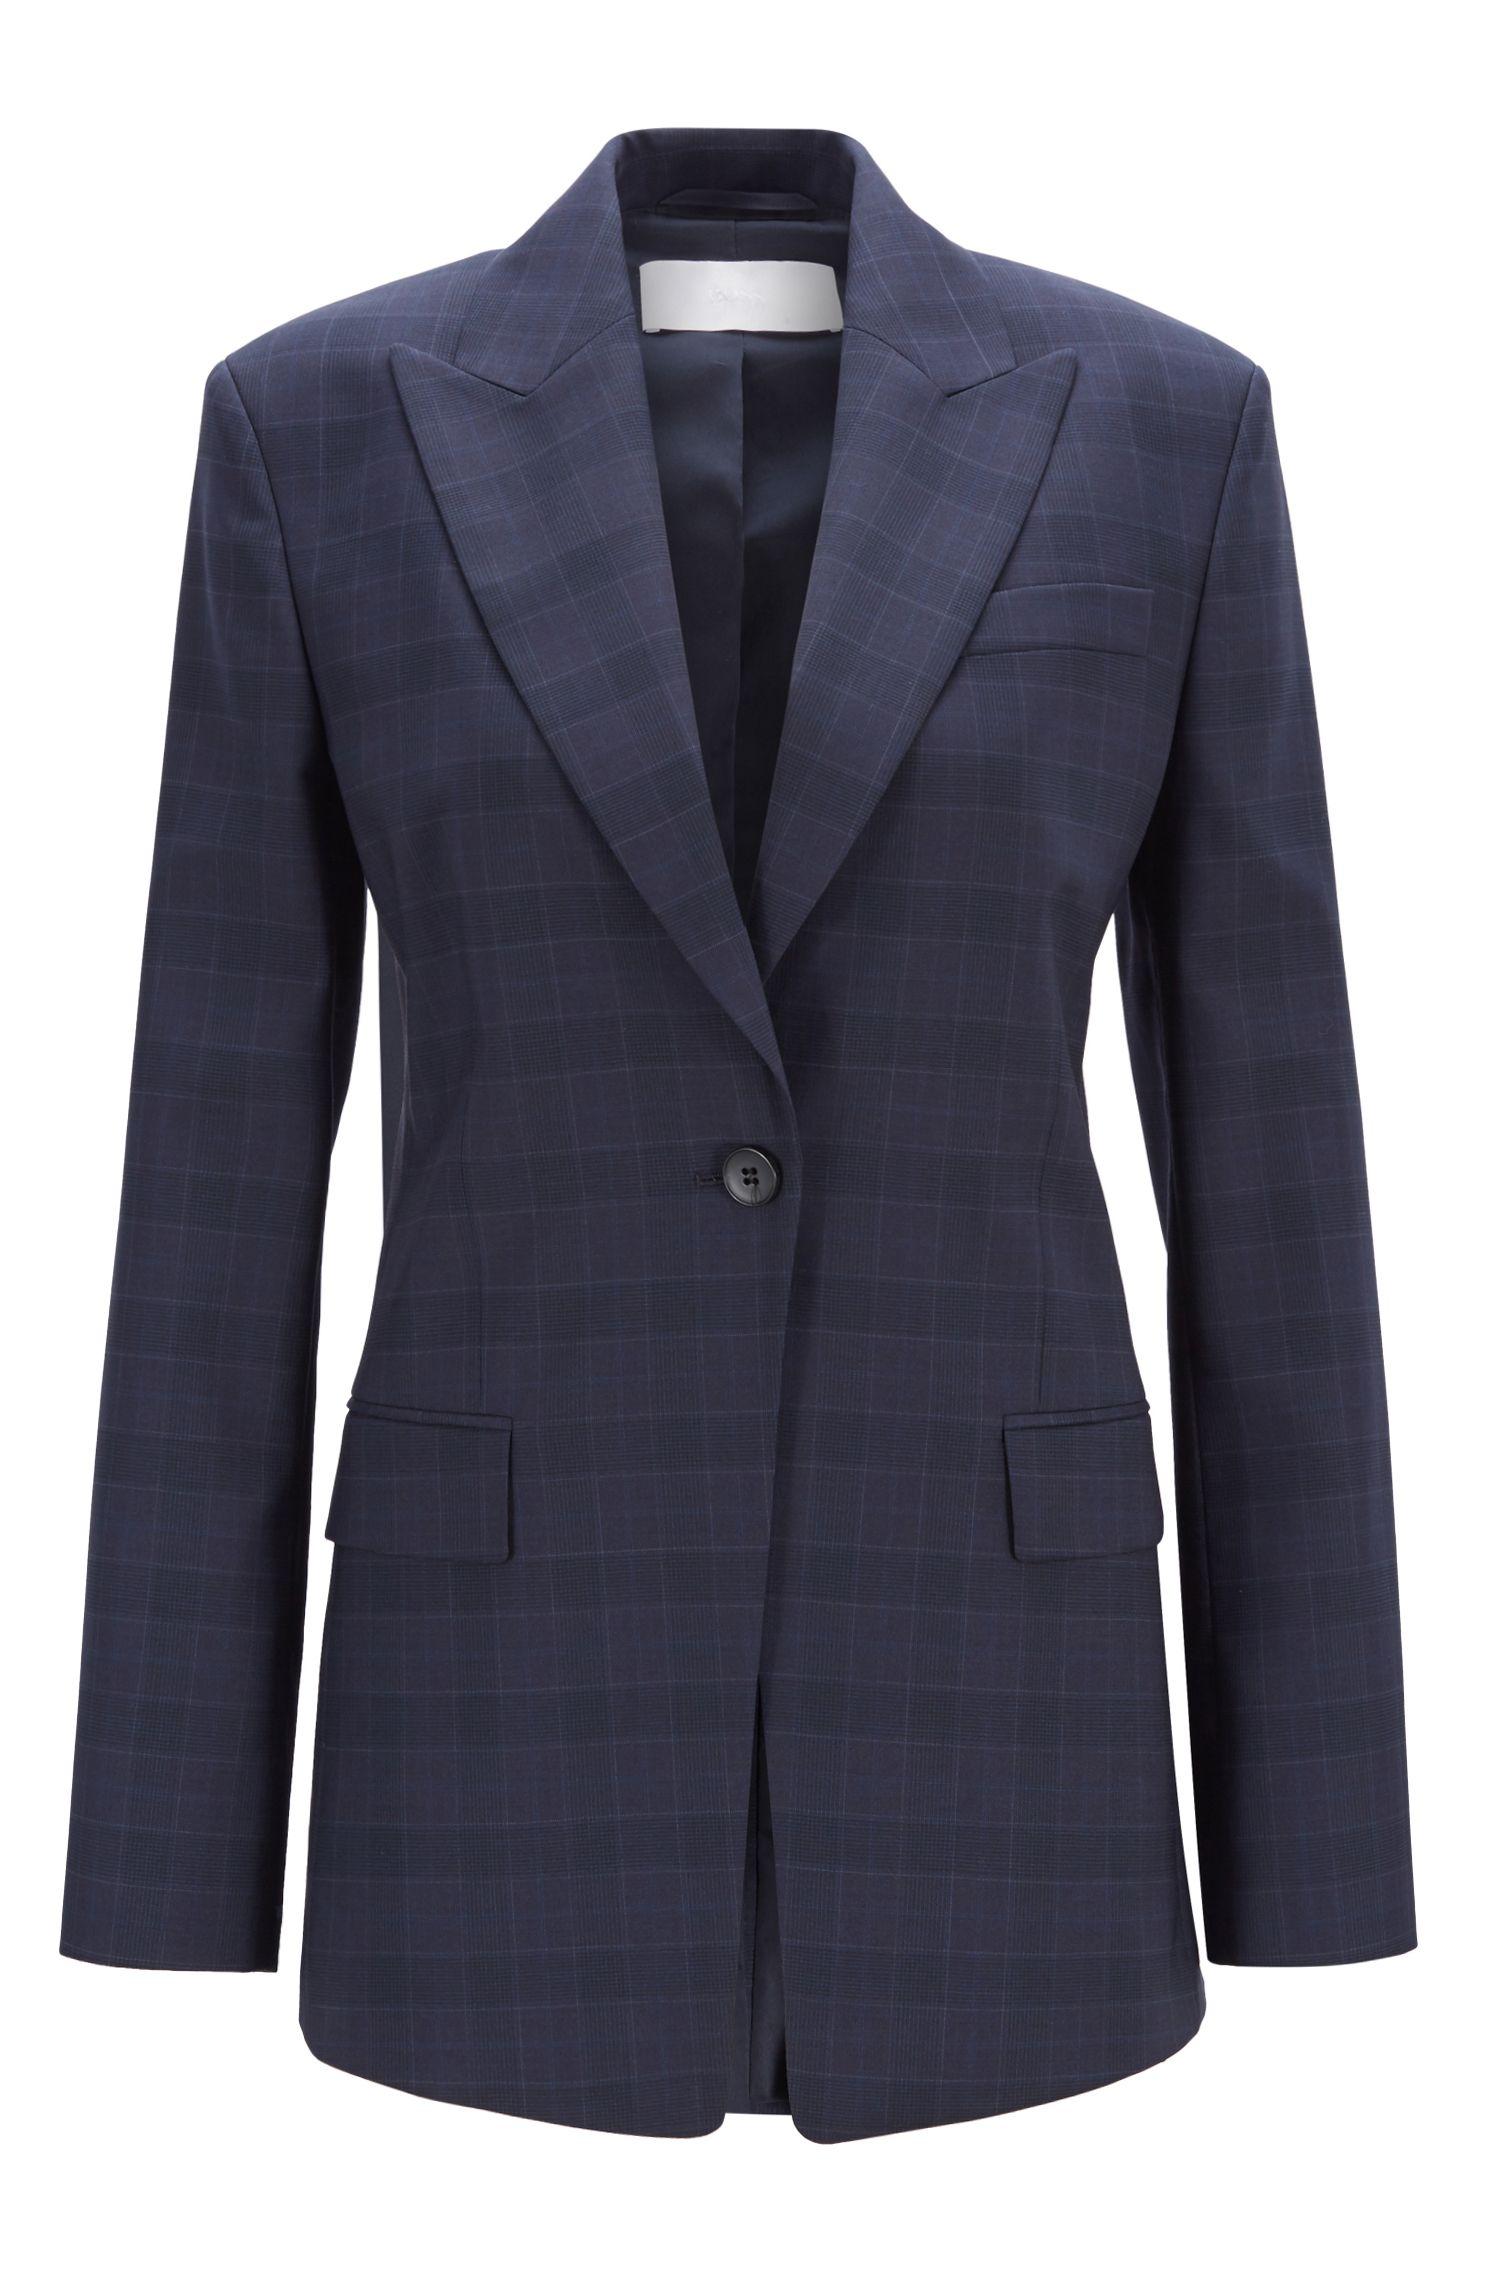 Regular-fit jacket in checkered Italian virgin wool, Patterned